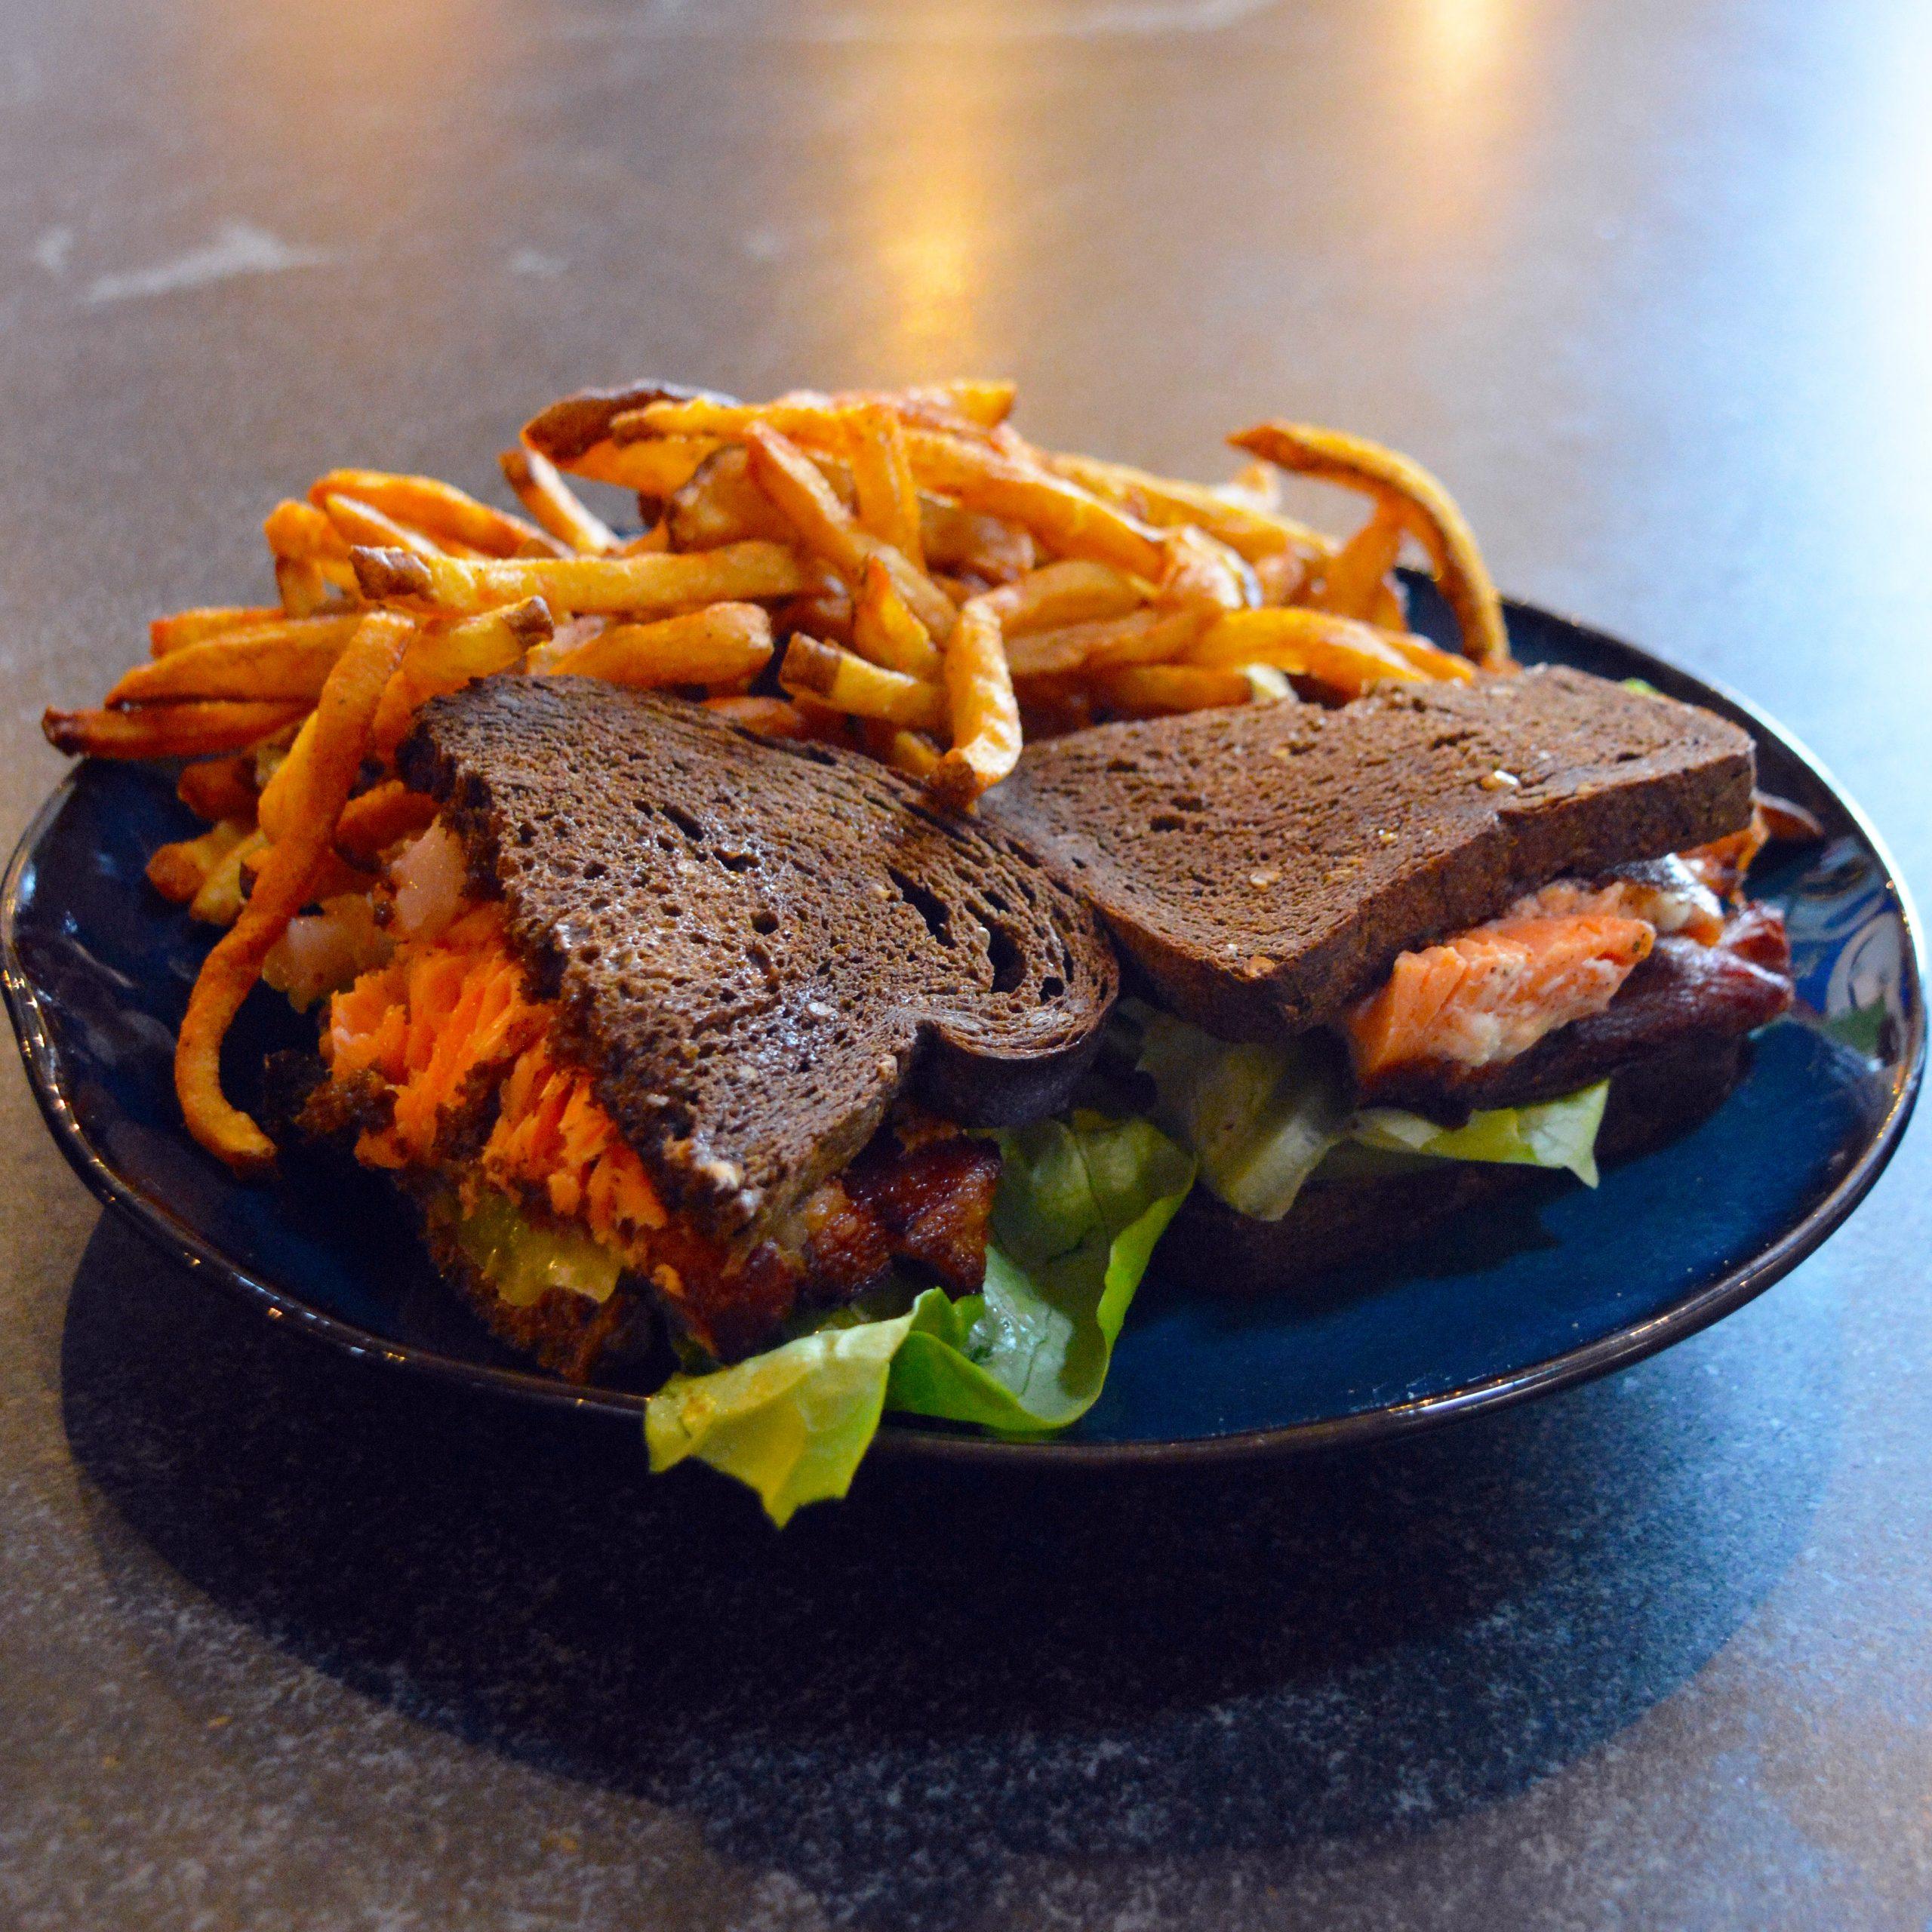 A photo of a Salmon Sandwich on Rye